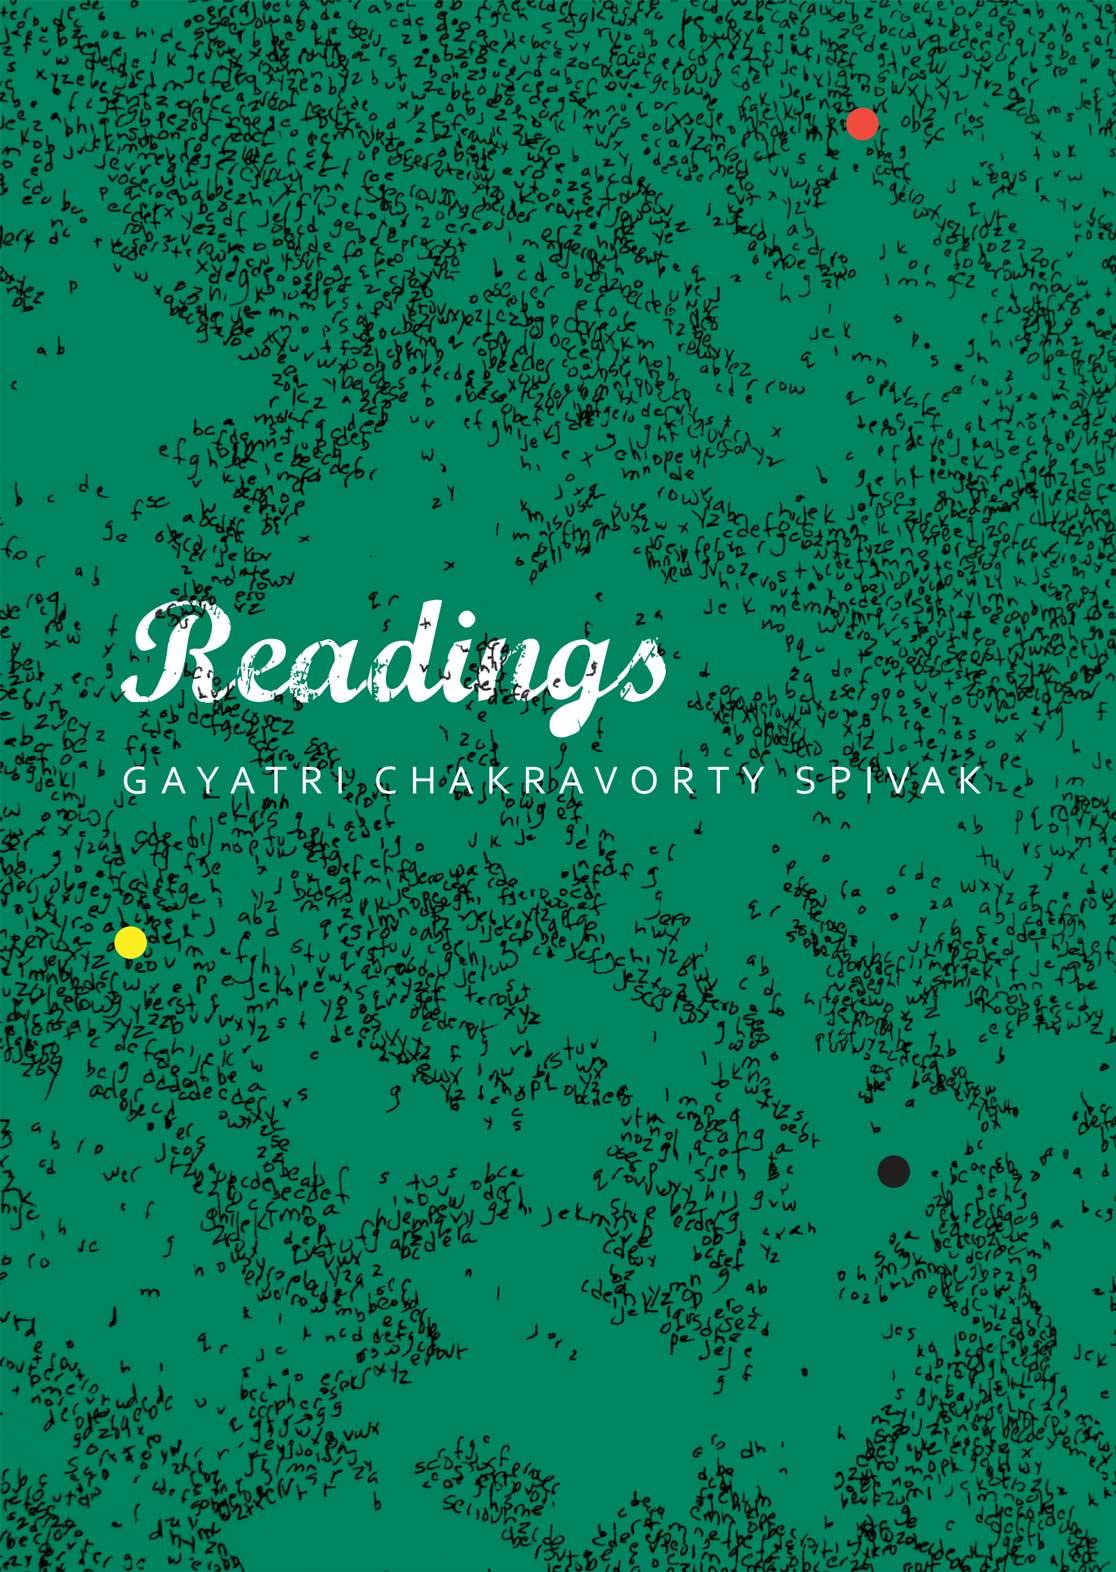 Readings by Gayatri Chakravorty Spivak | Seagull Books